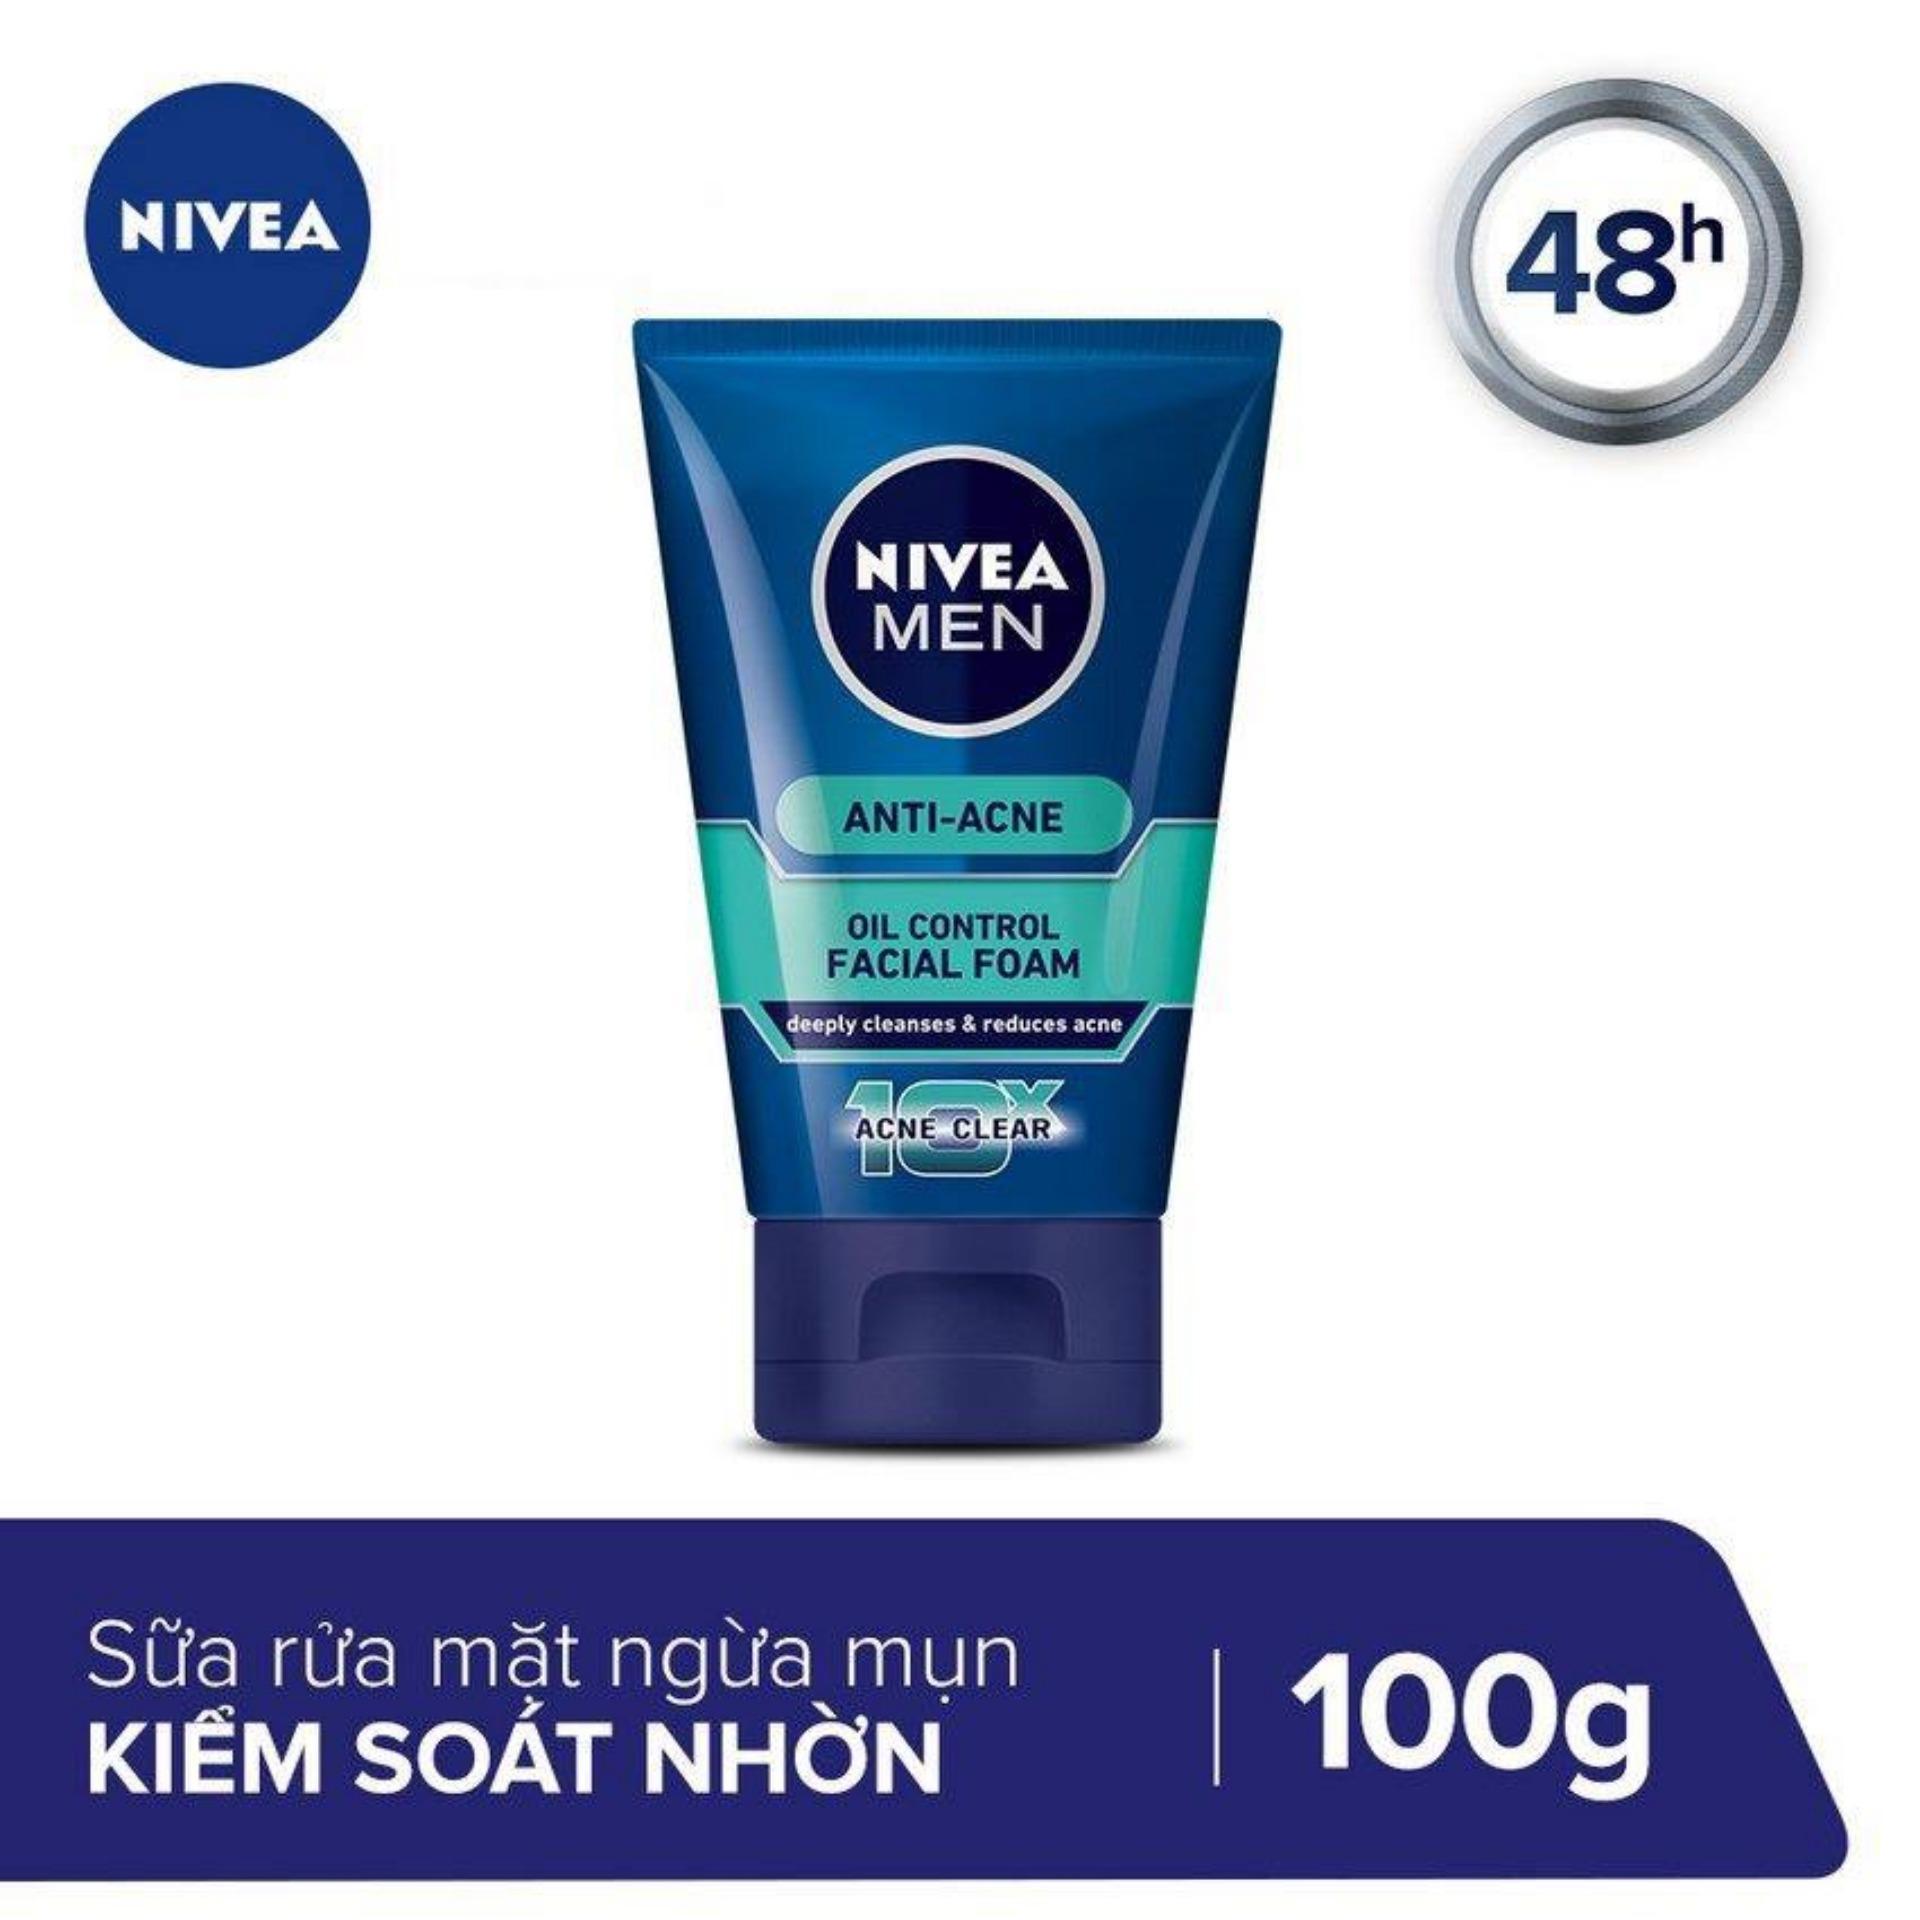 Sữa rửa mặt nam ngăn ngừa mụn tối ưu Nivea Men 10X Acne Clear Face Wash 100g